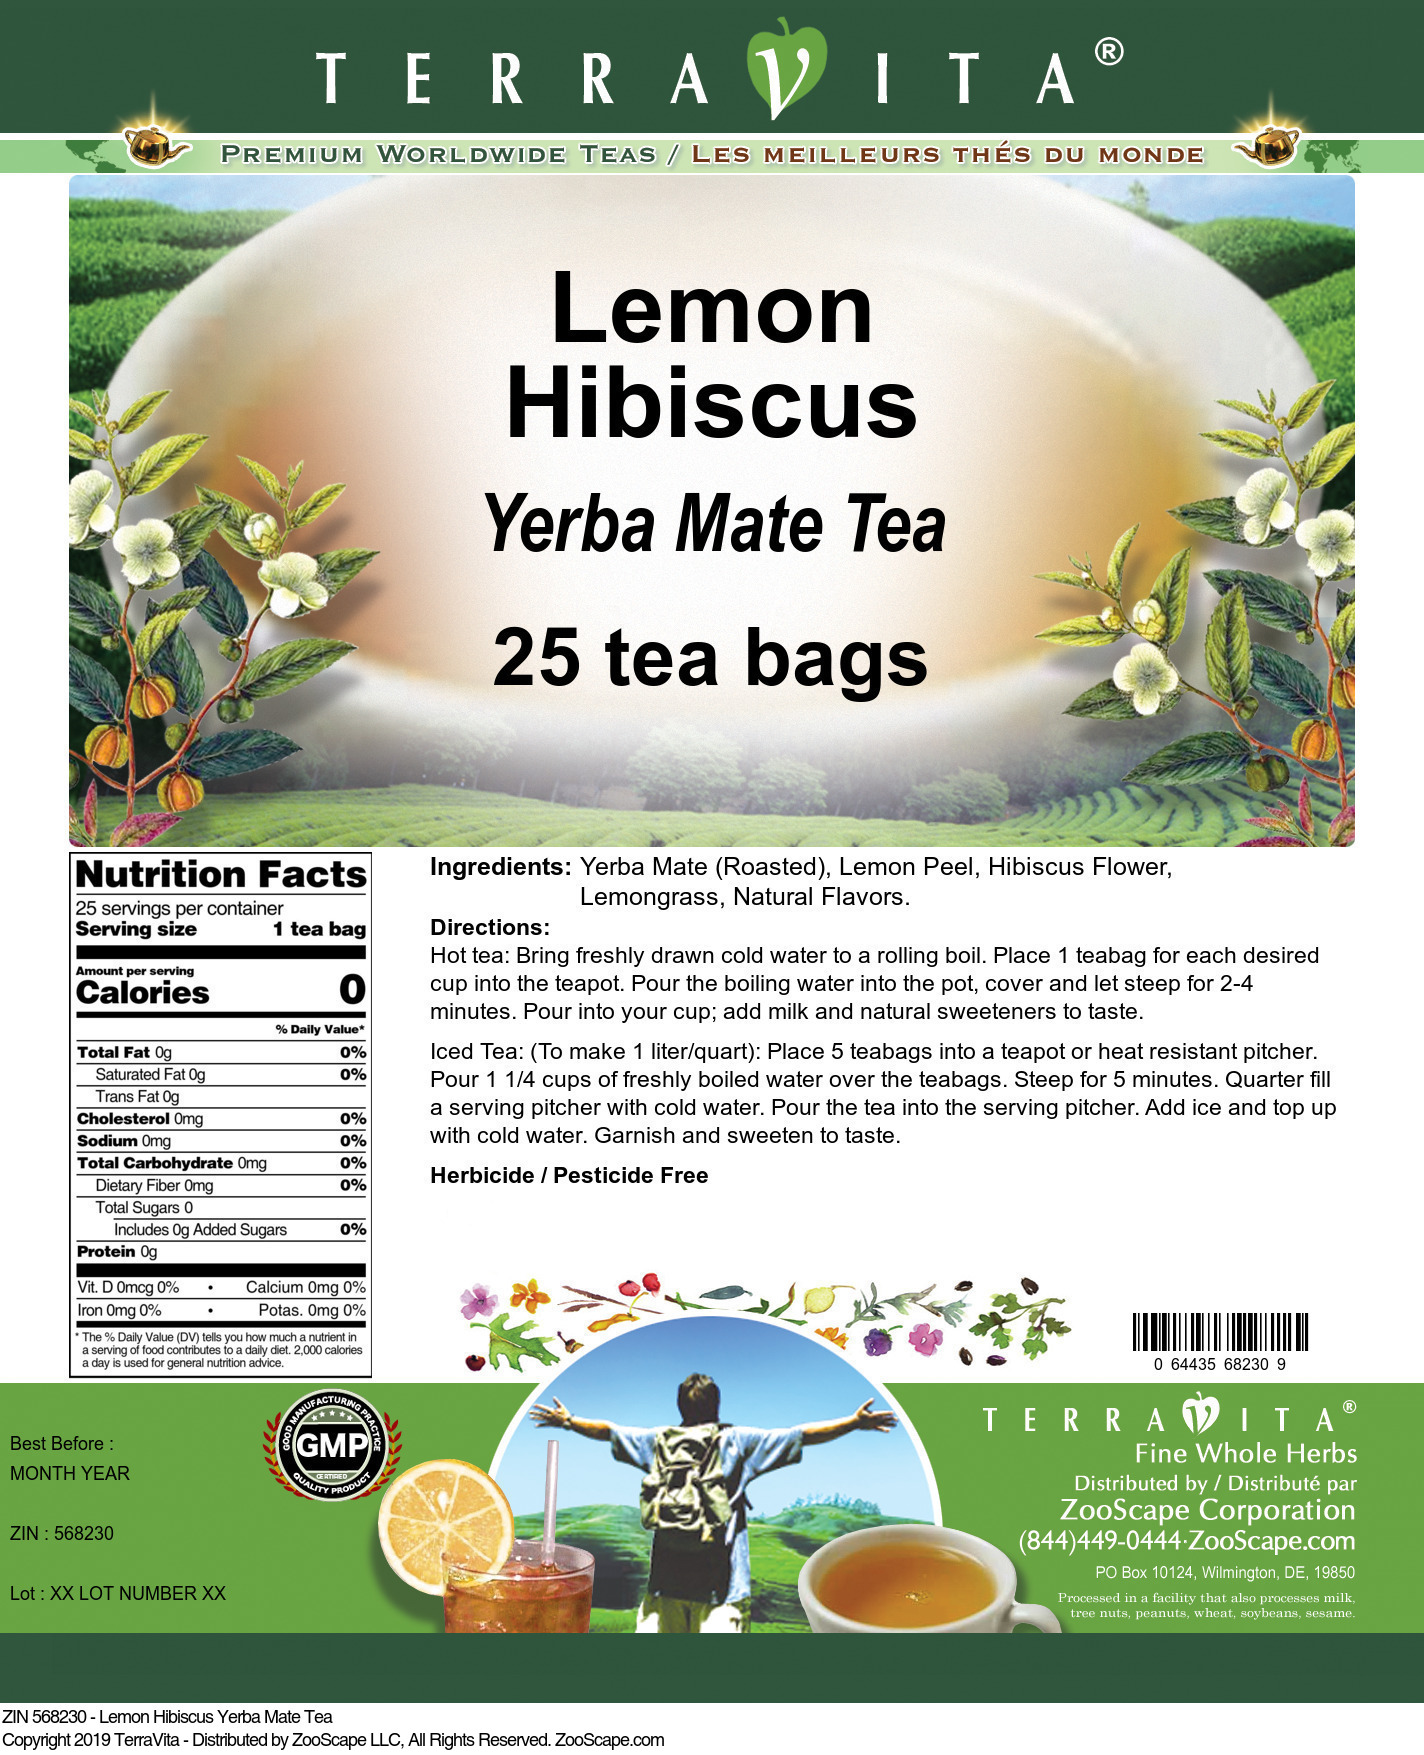 Lemon Hibiscus Yerba Mate Tea